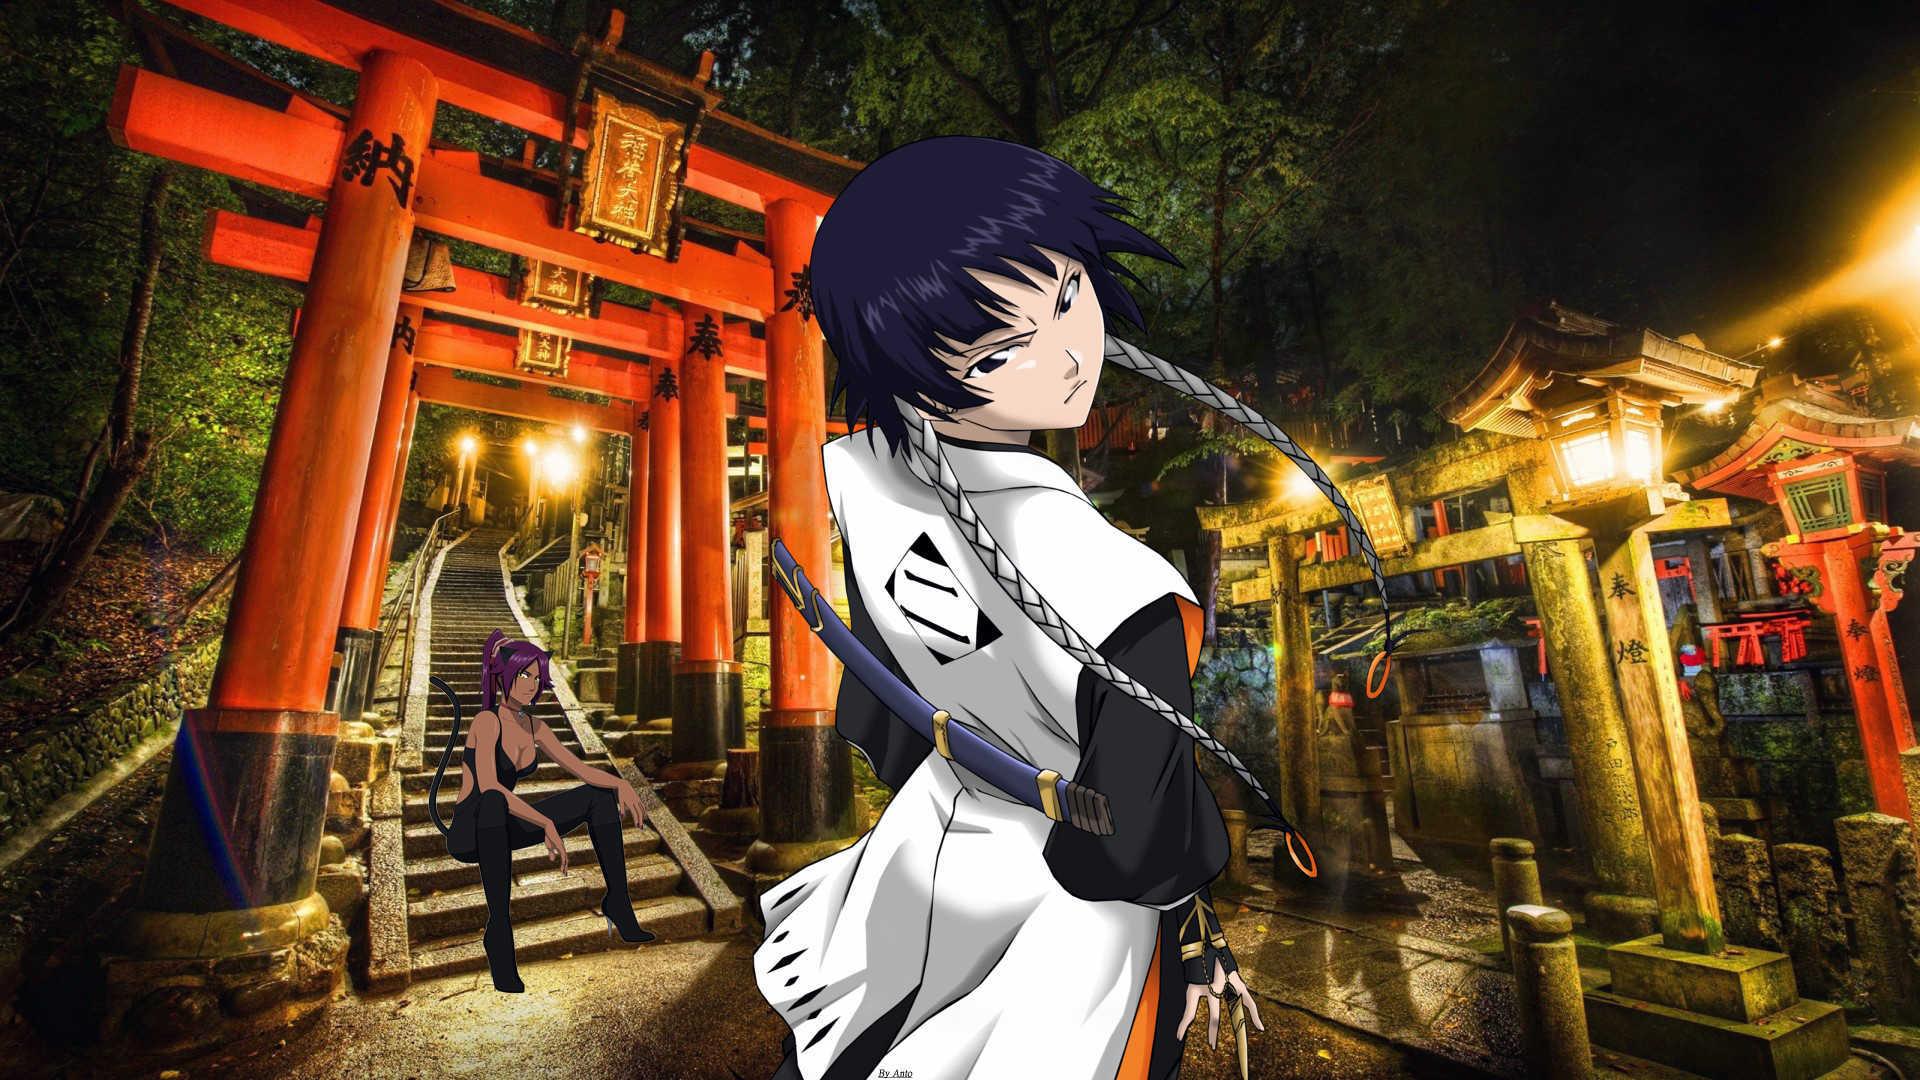 Anime Wallpaper Hd Group